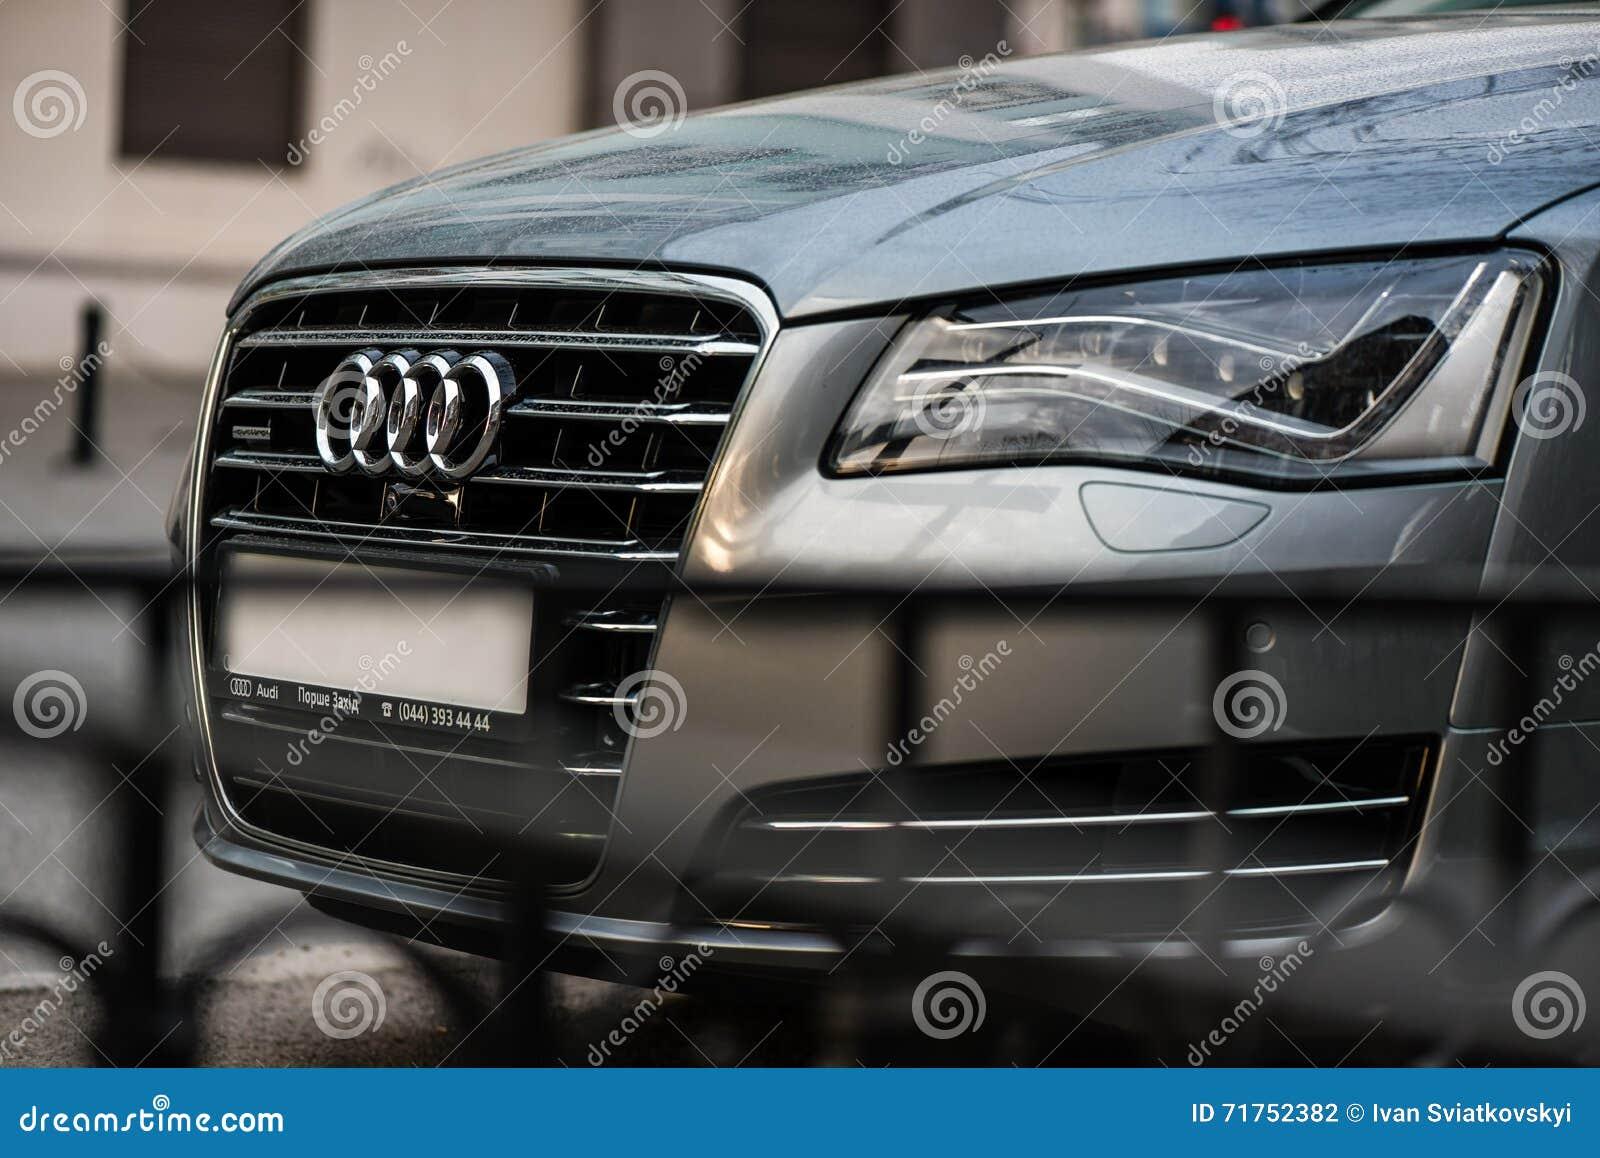 Kyiv, Ουκρανία - 10 Απριλίου 2016: Το έμβλημα στα μπροστινά κάγκελα ενός φορείου Audi πολυτέλειας στην οδό πόλεων